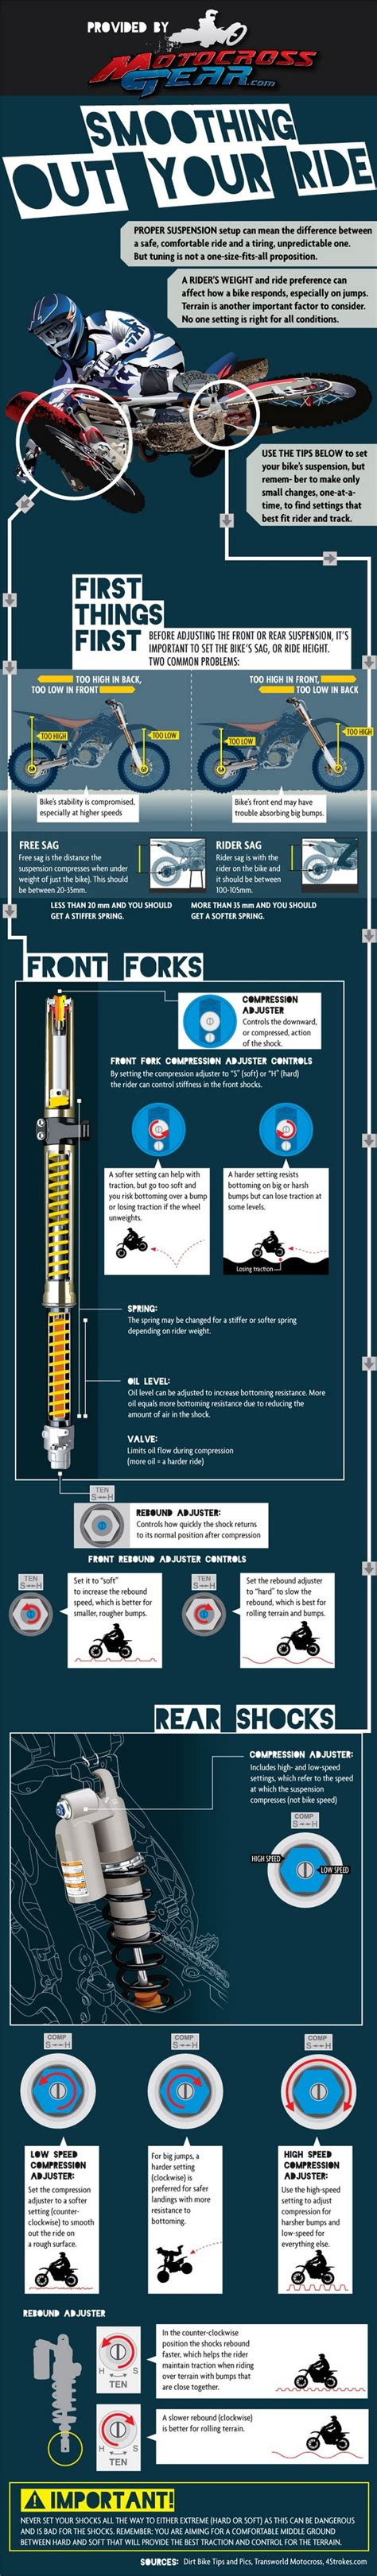 suspension tuning chart suspension setup guide motocross gear utv atc